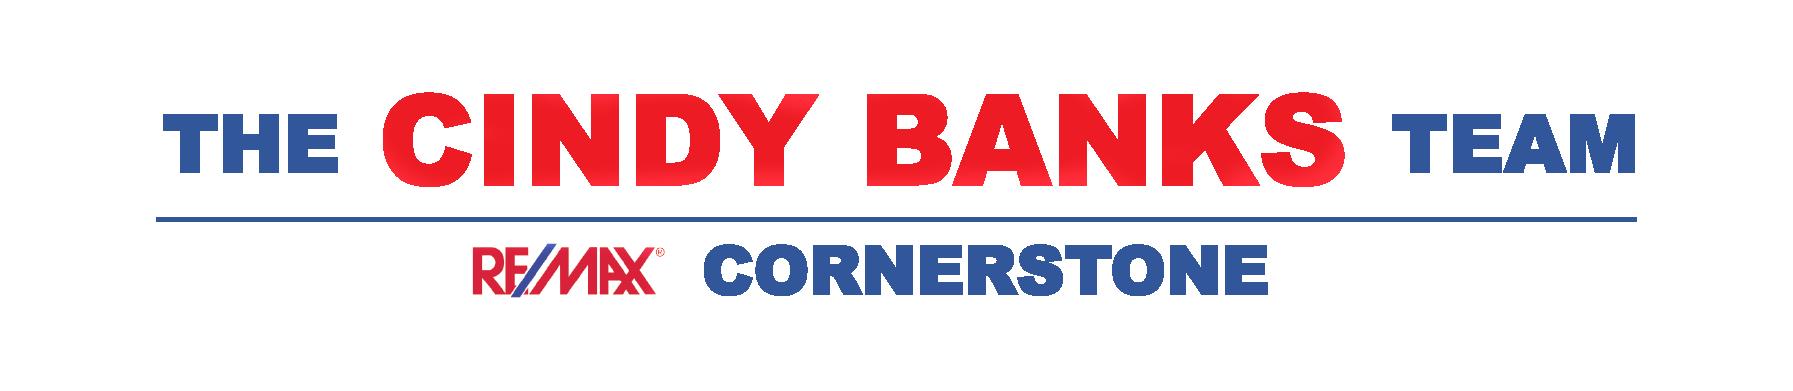 Cindy-Banks-Team-LogoBetterColors-copy.png